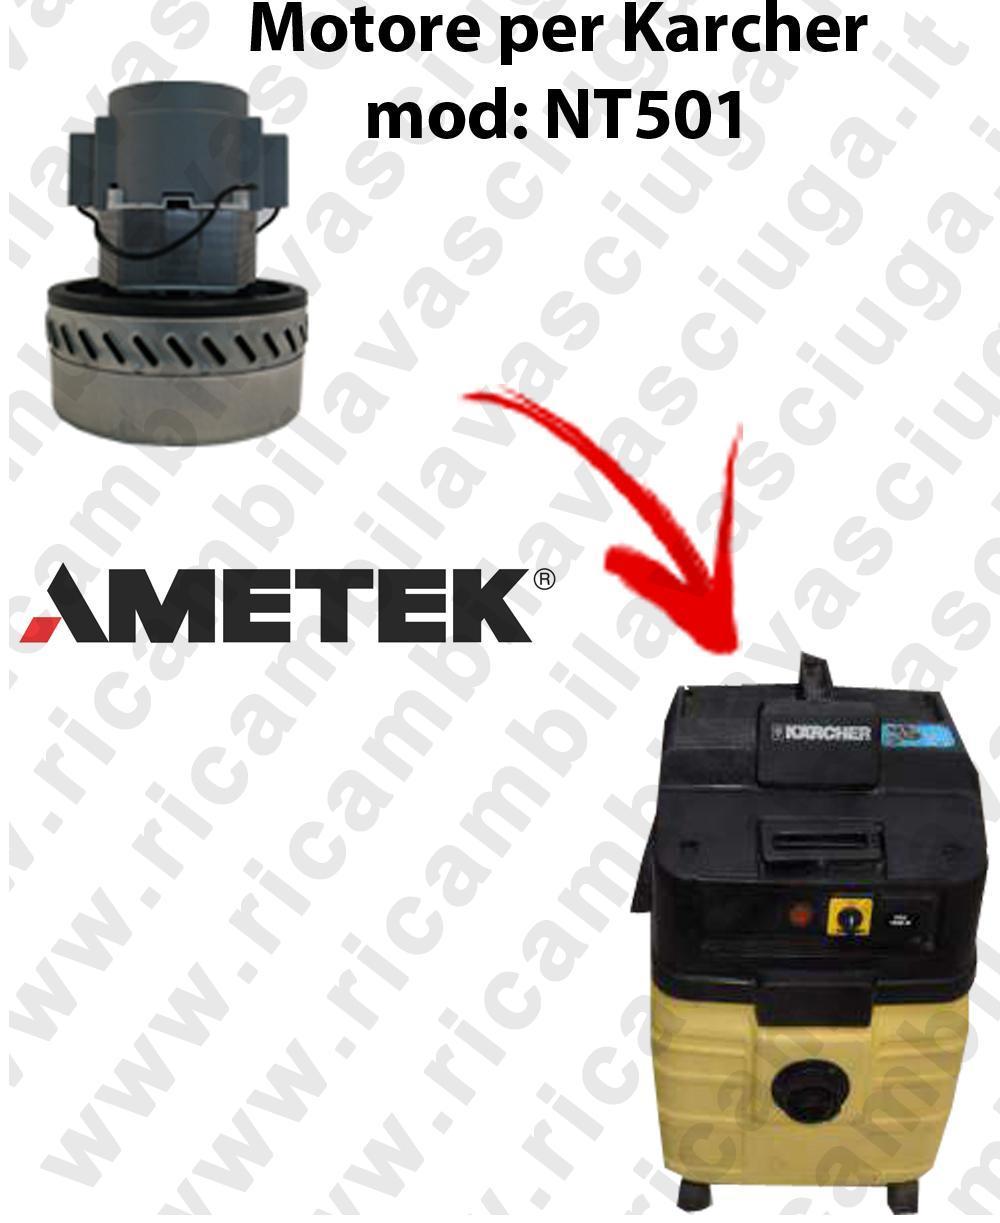 NT501 Ametek Vacuum Motor for vacuum cleaner KARCHER